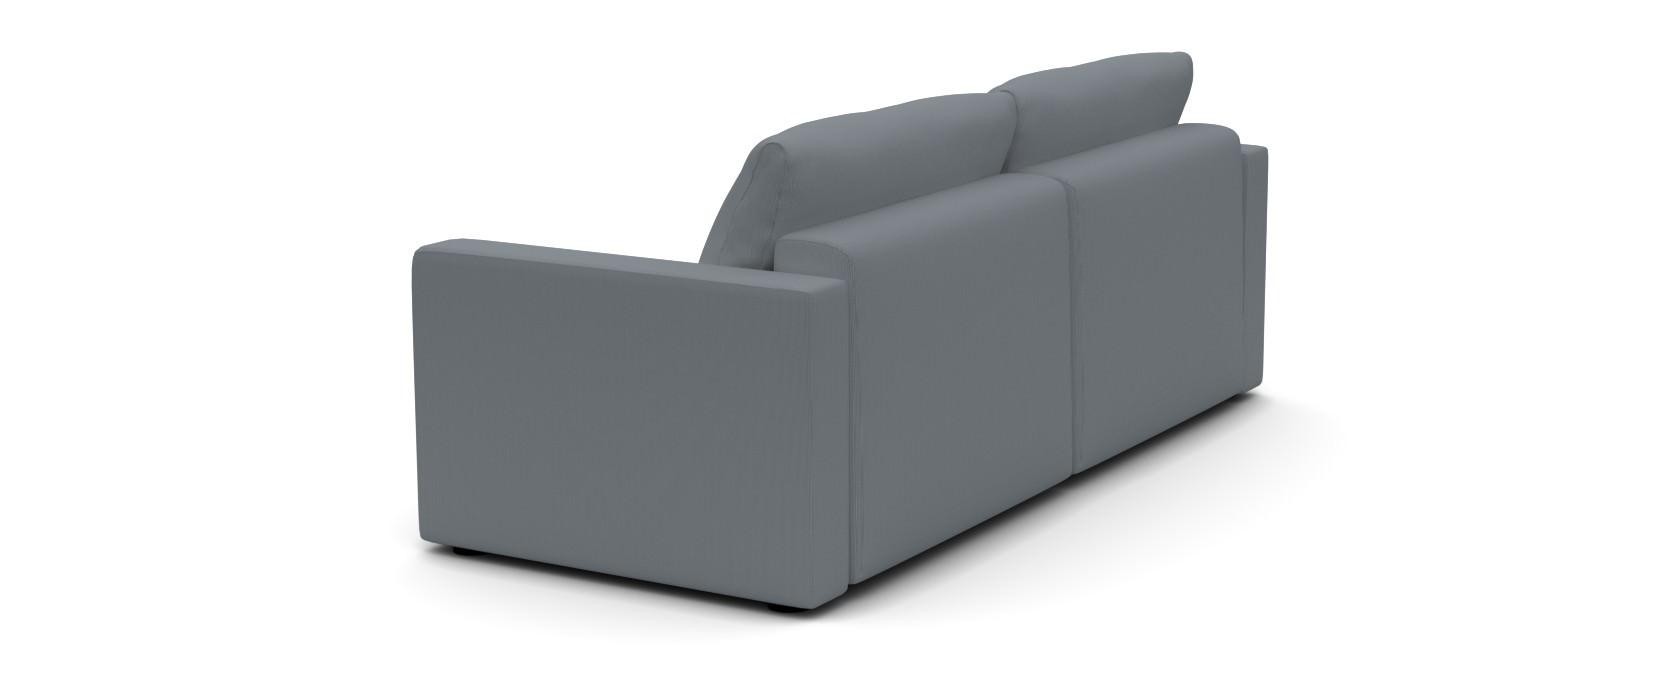 3-Sitzer Schlafsofa Teo